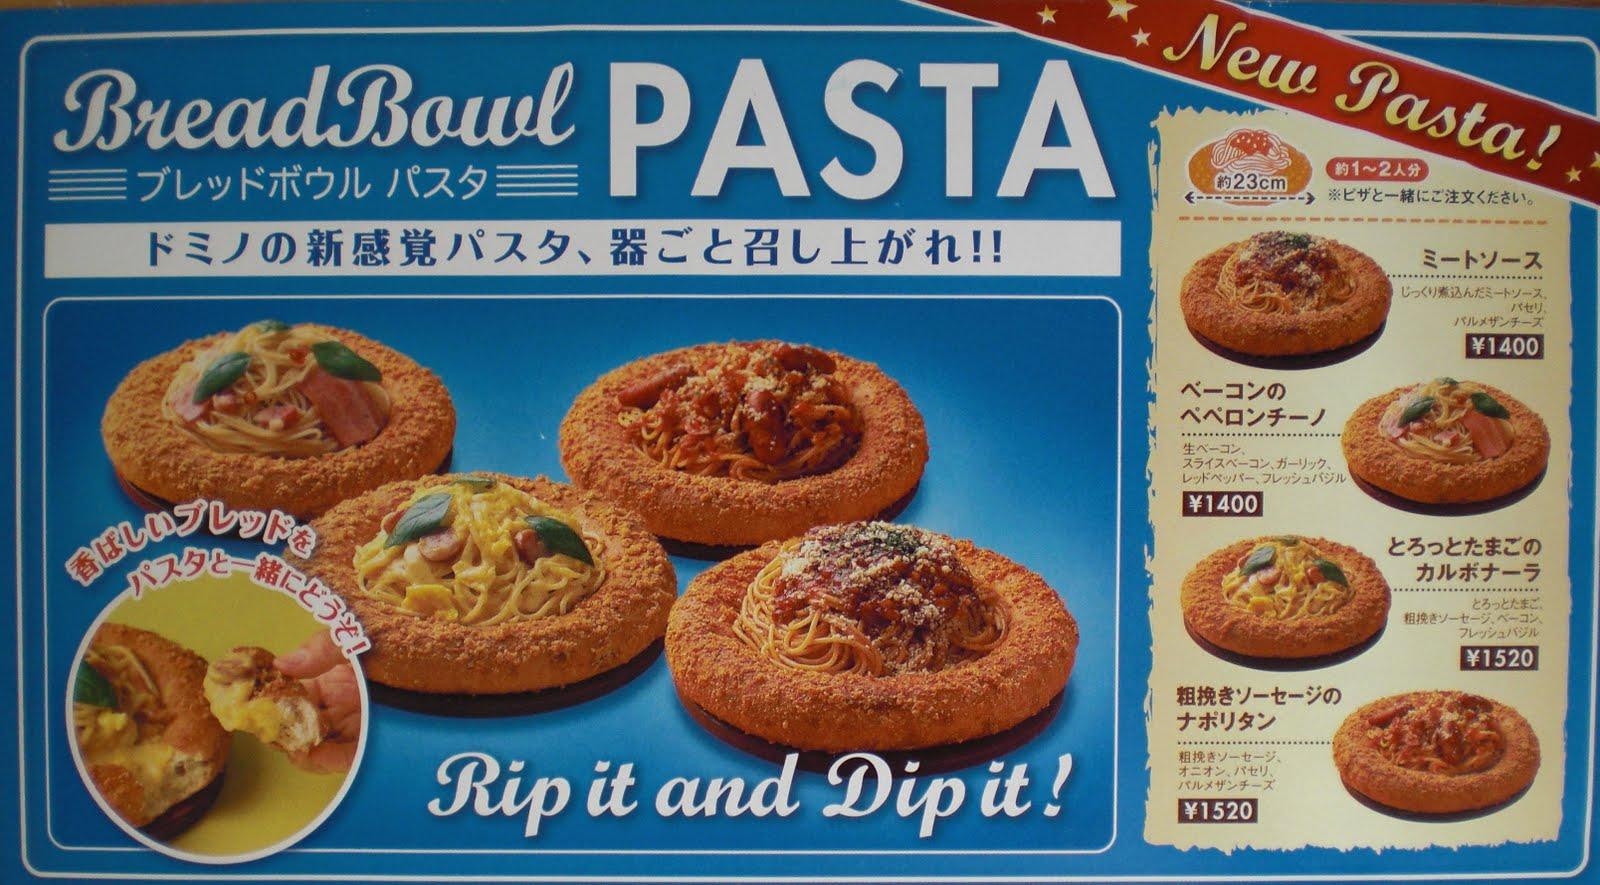 The Intercultural: BreadBowl Pasta